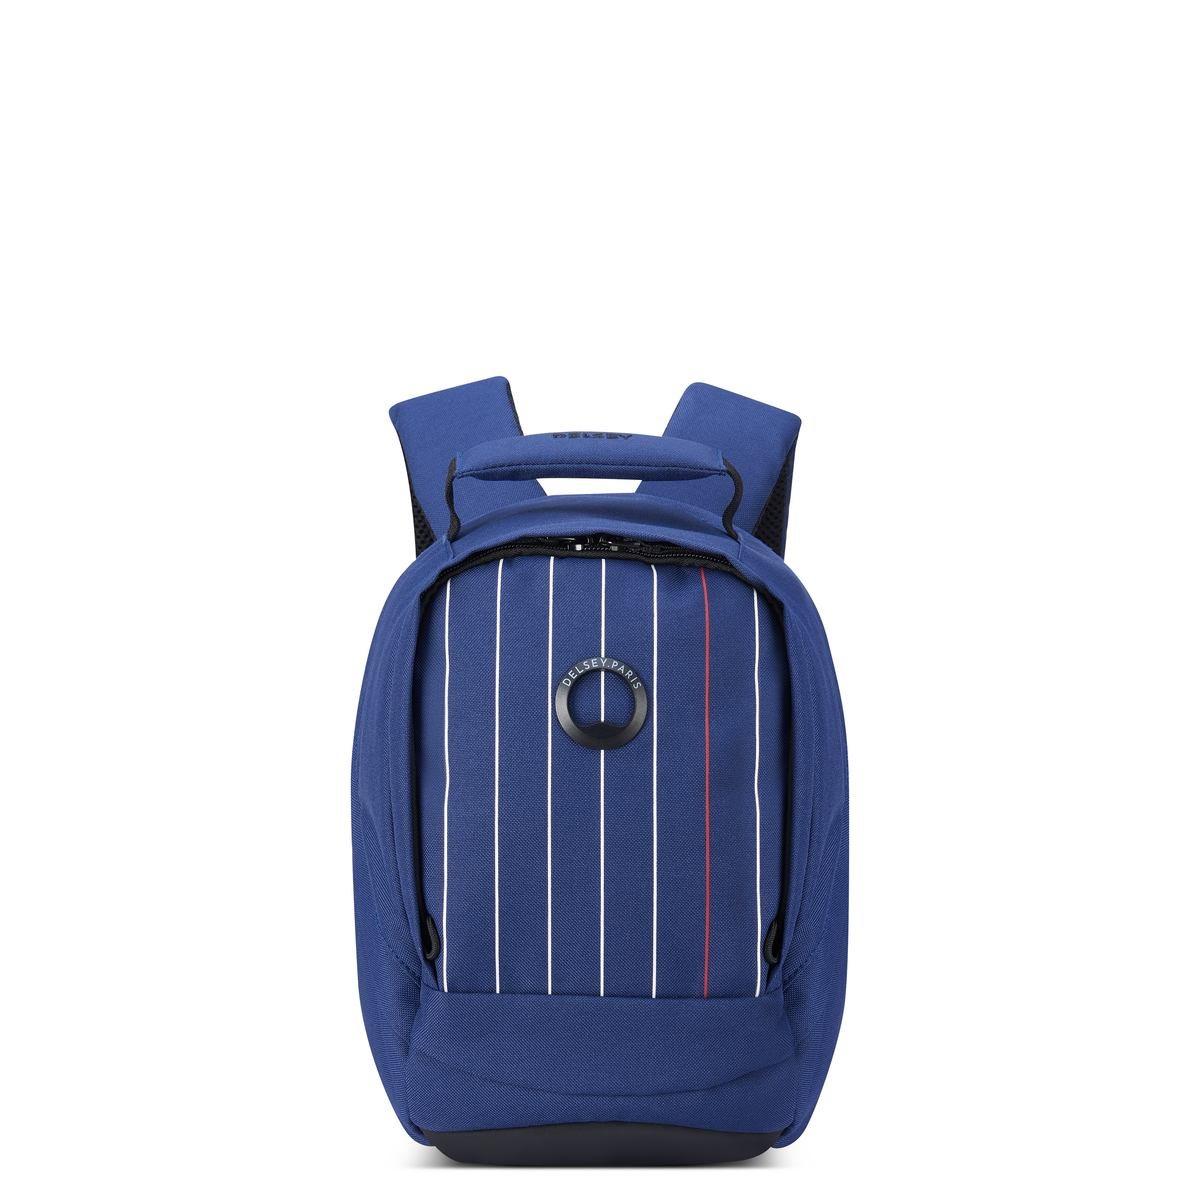 Delsey σακίδιο πλάτης 30.5x21.5x14.5cm Securban Micro Printed Blue